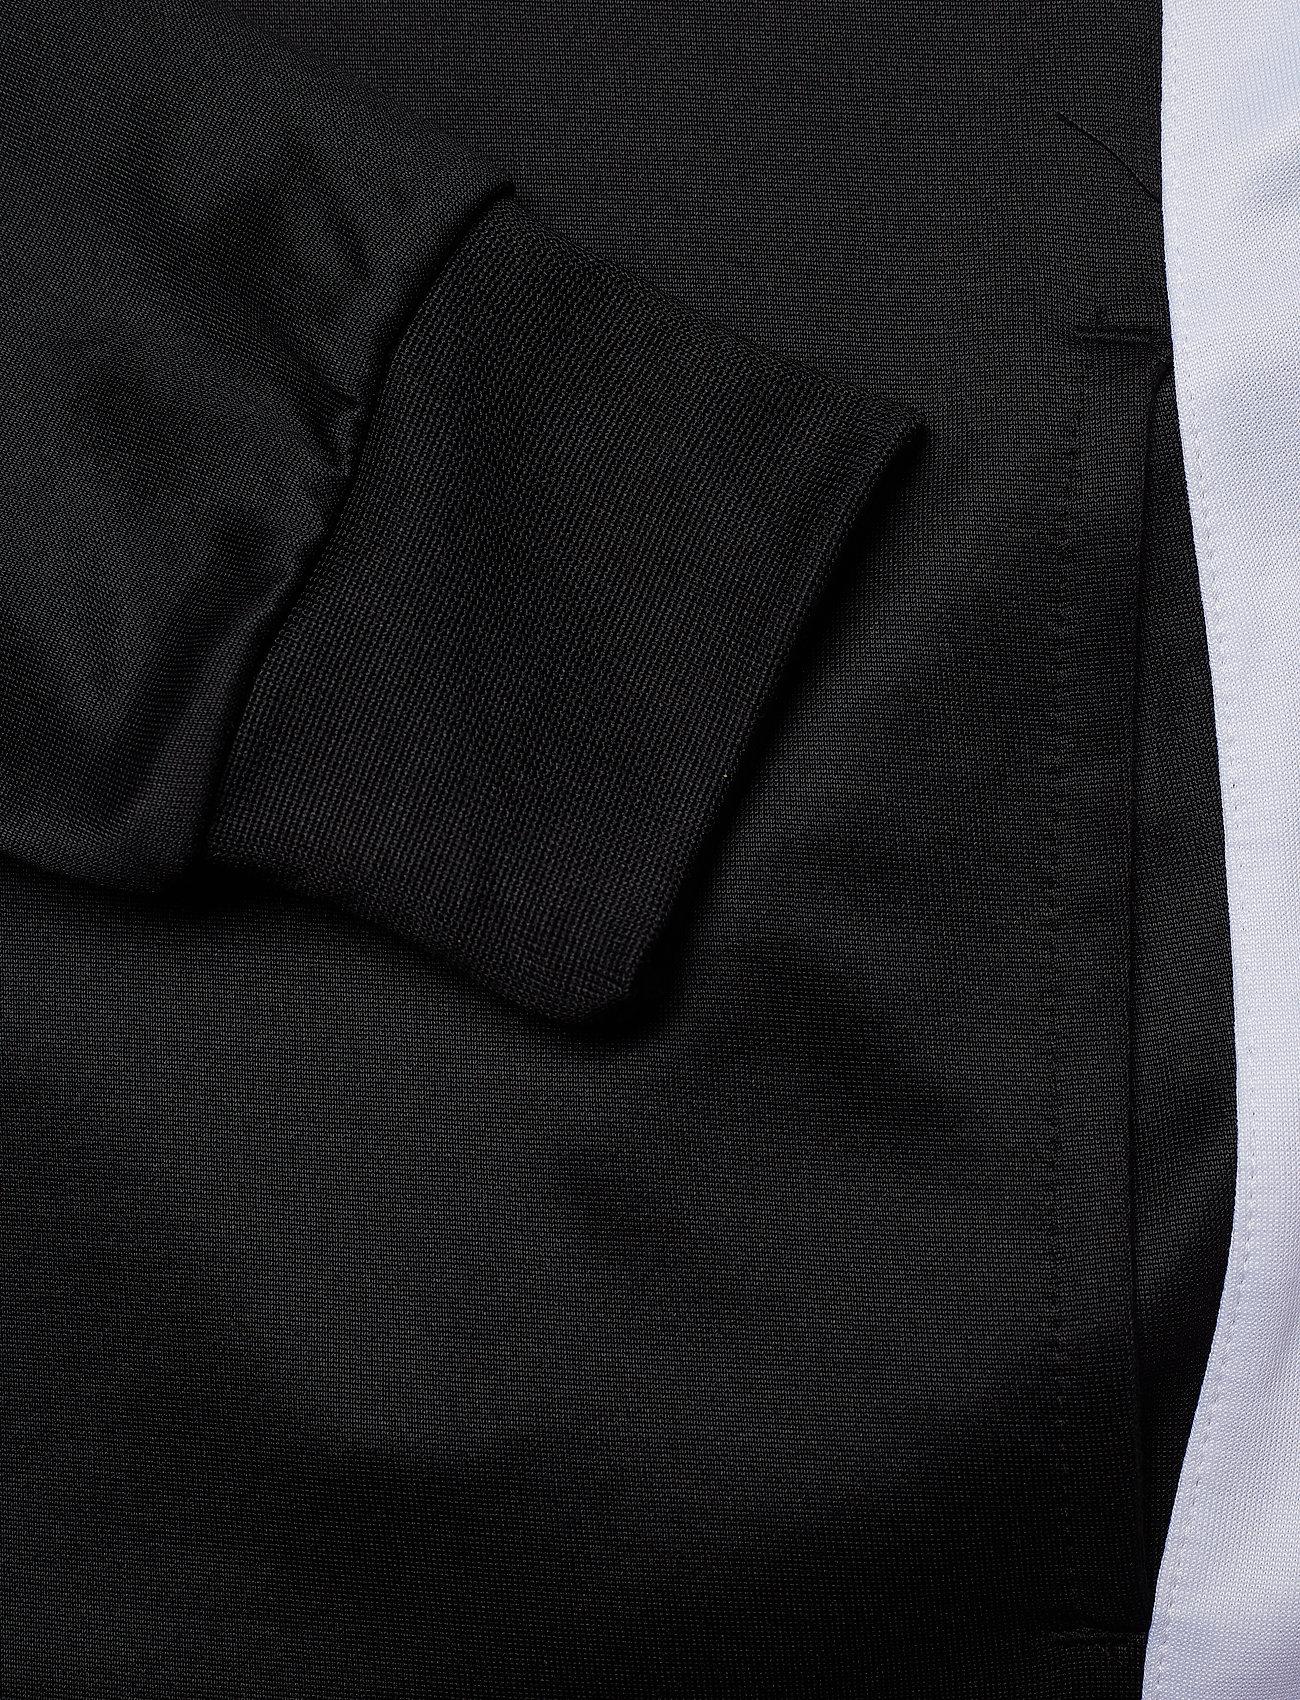 Hmlclara Half Zip Jacket (Black) (385 kr) - Hummel Hive